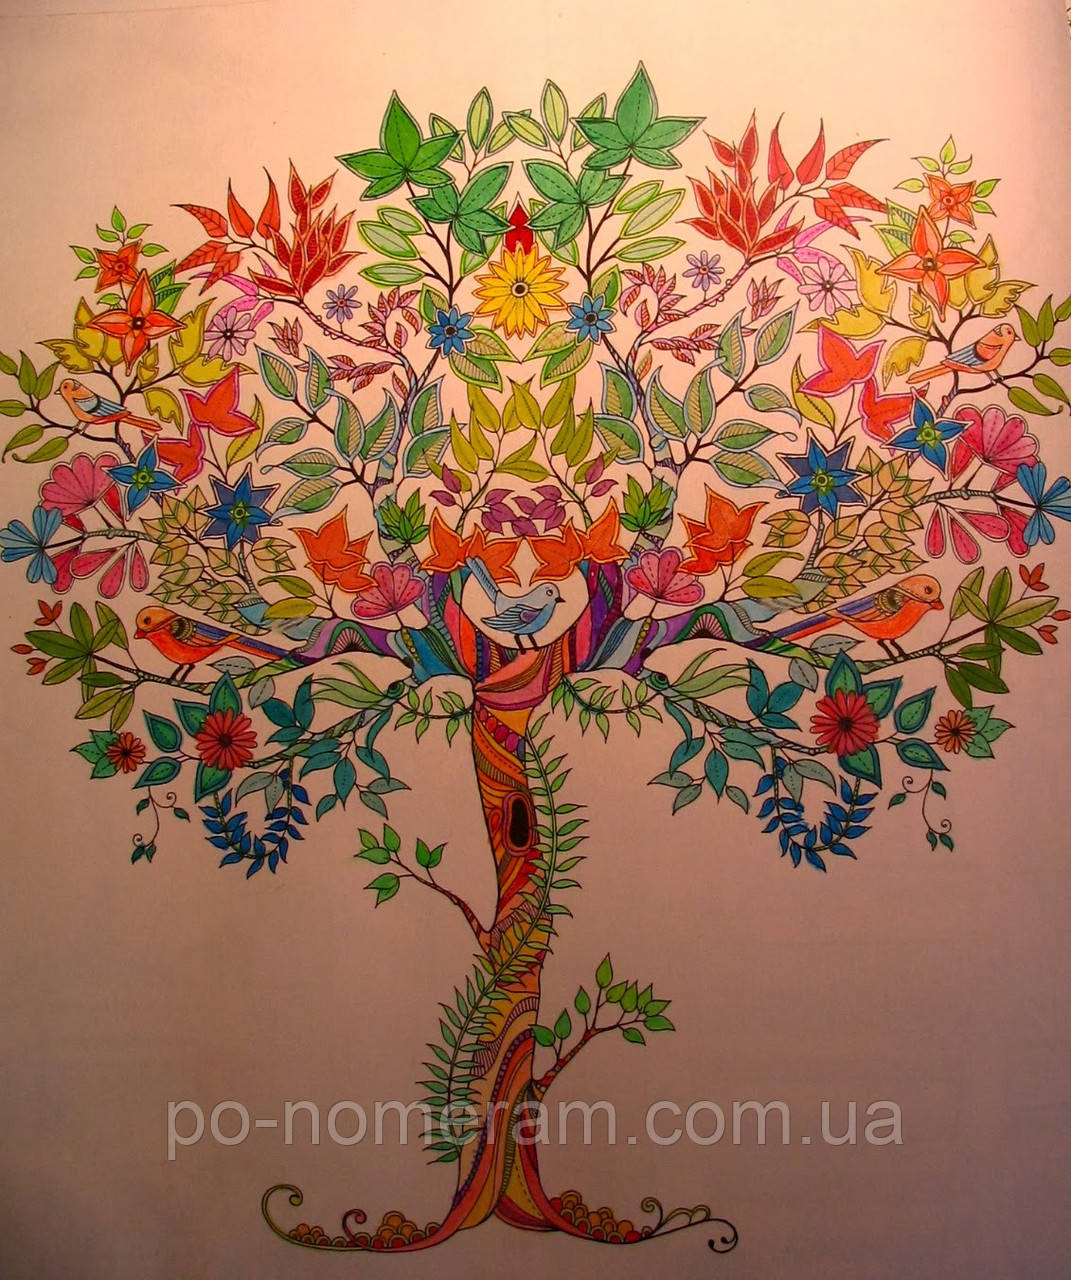 Раскраски антистресс украина